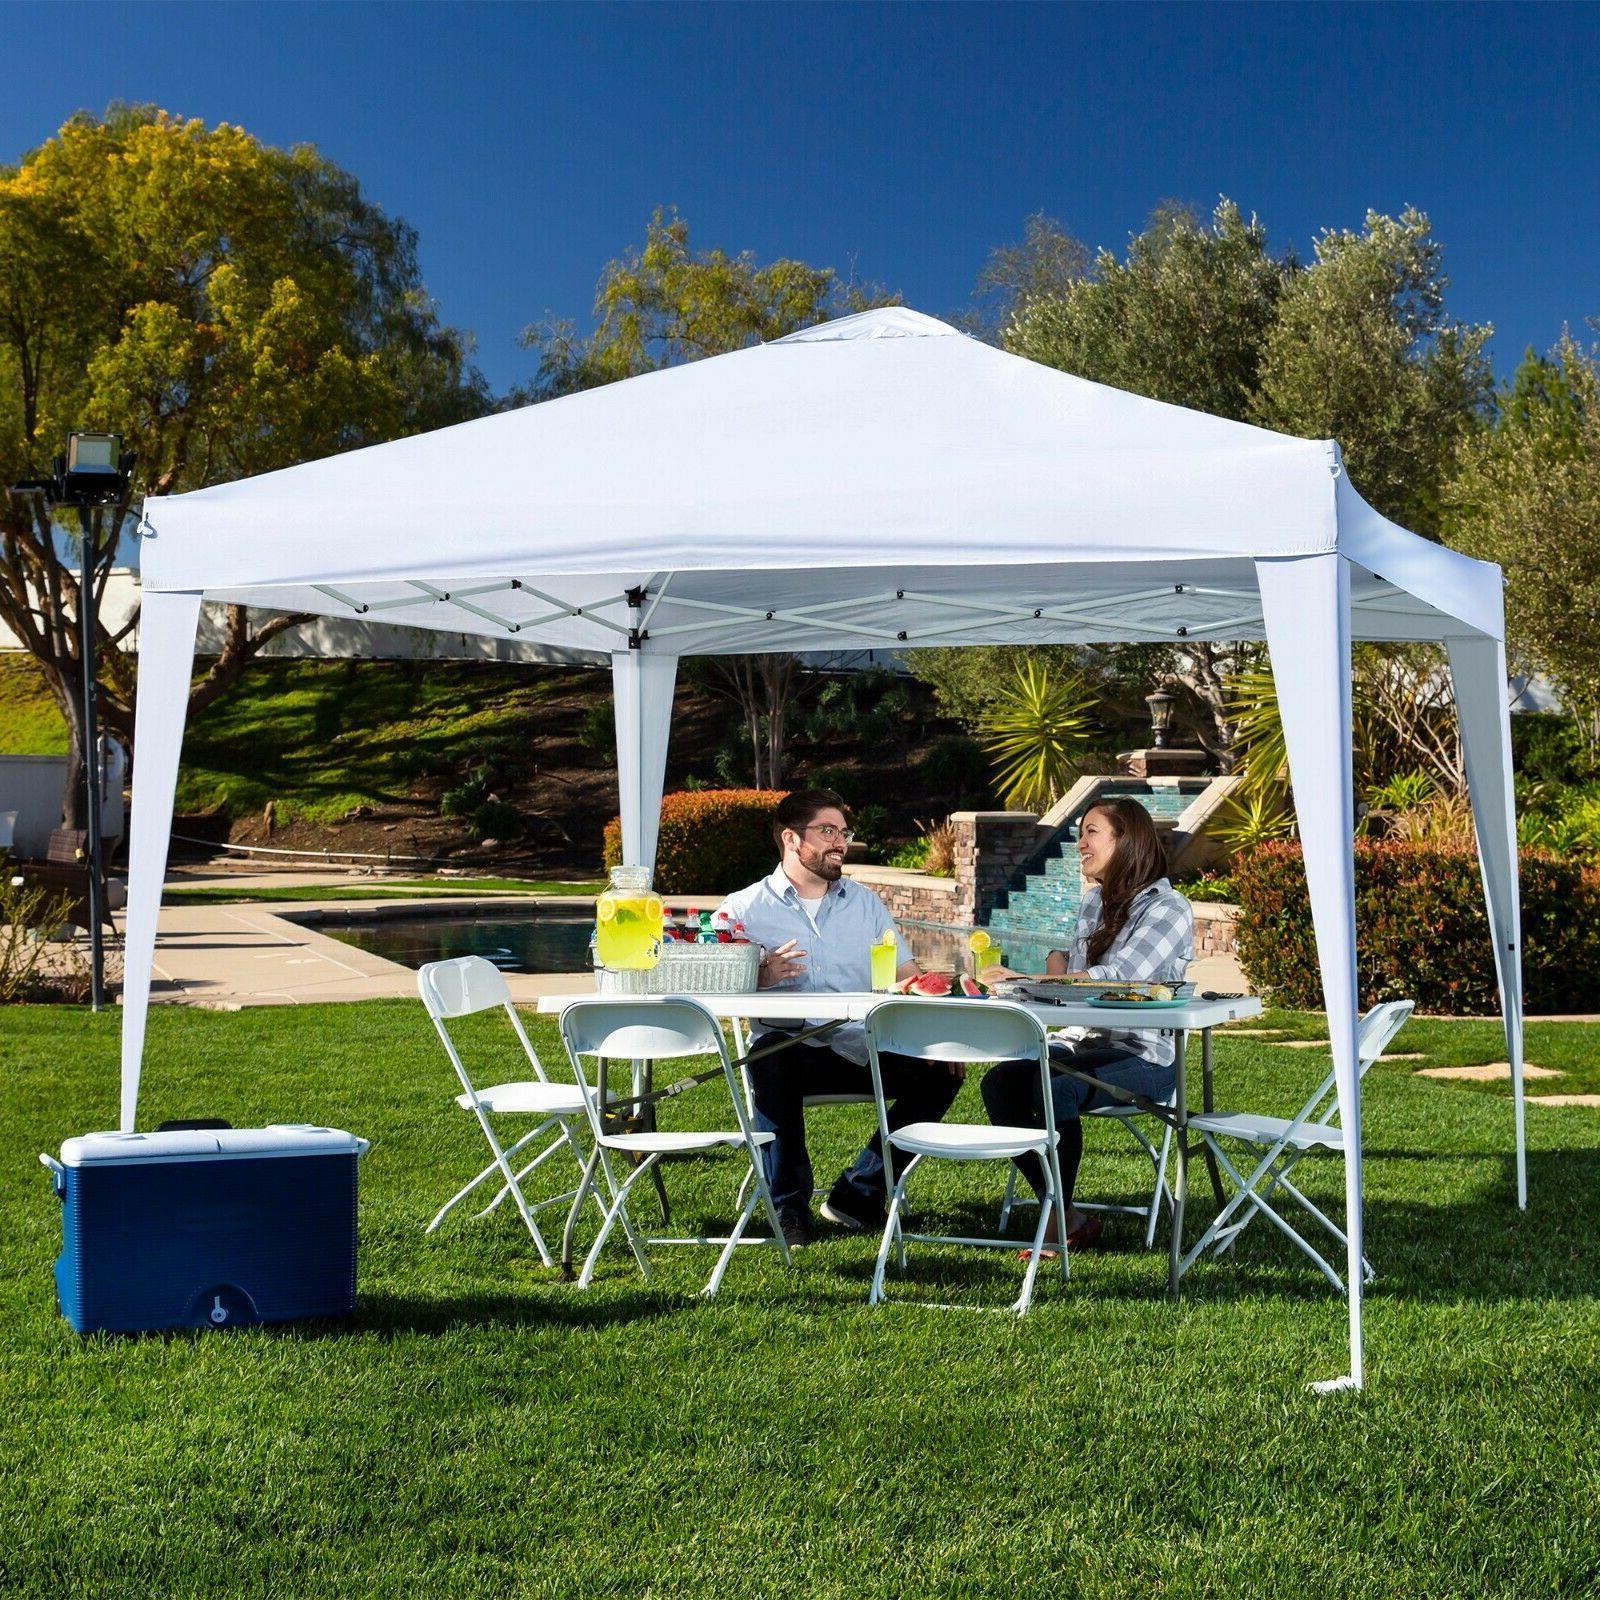 outdoor portable adjustable instant pop up gazebo